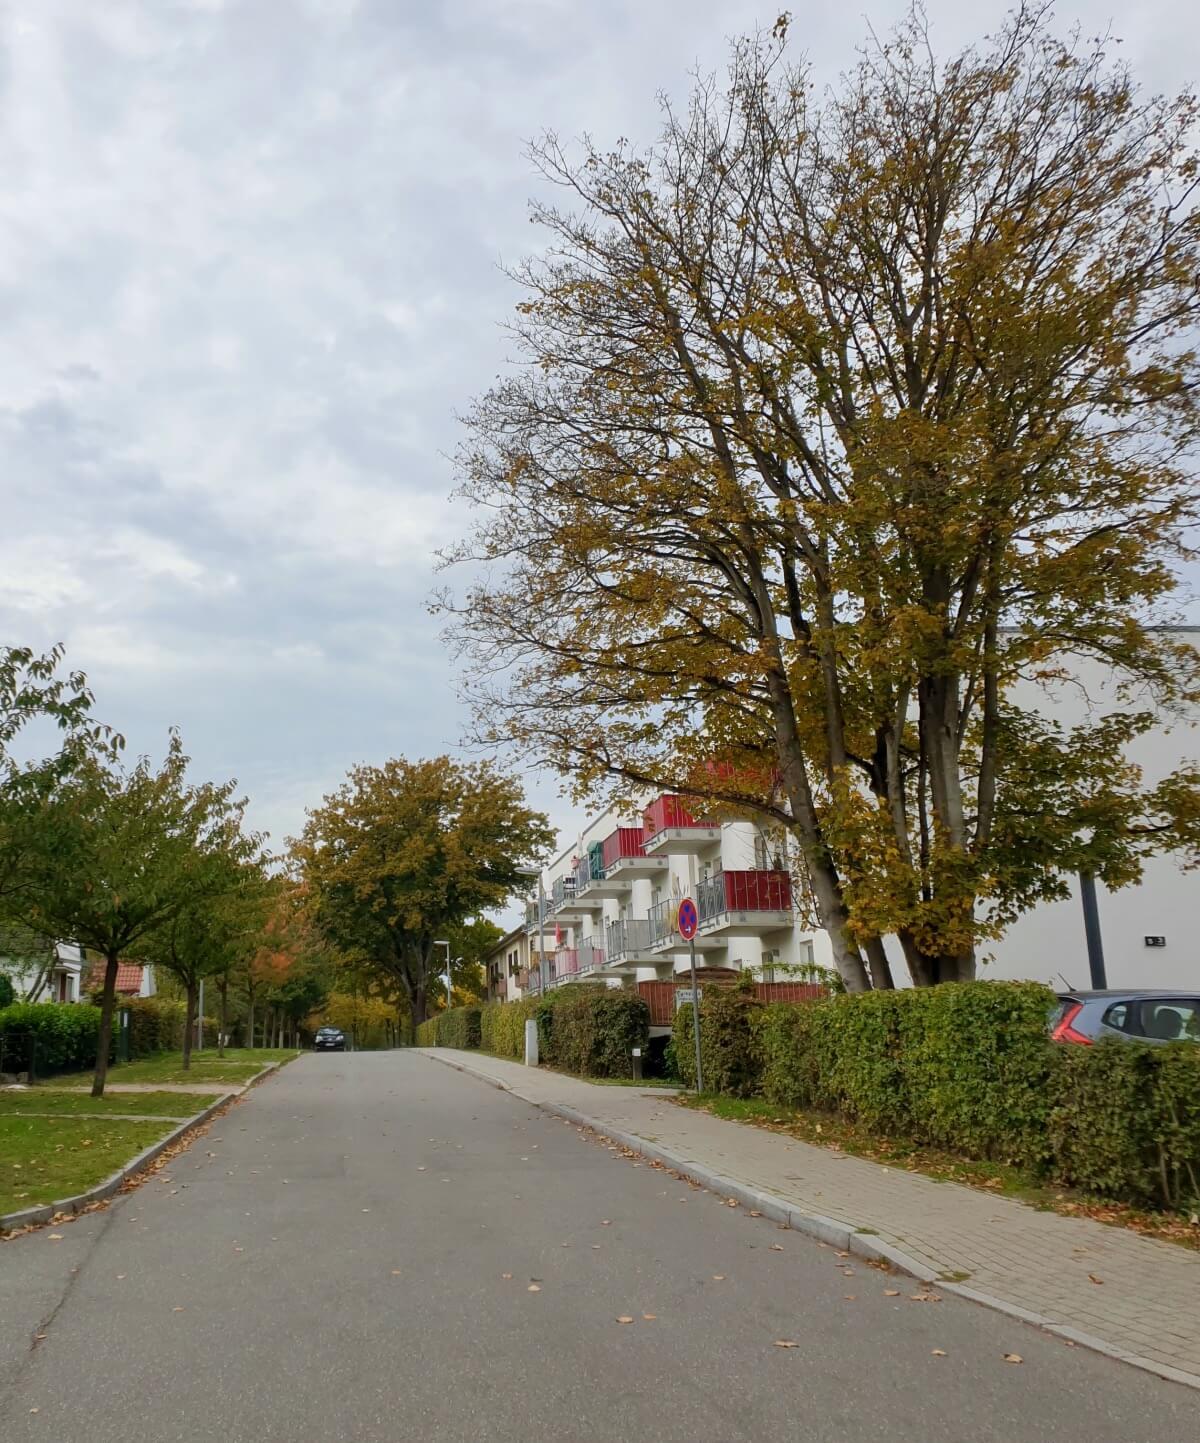 Fannyhöh in Ahrensburg –Foto: Nicole Schmidt